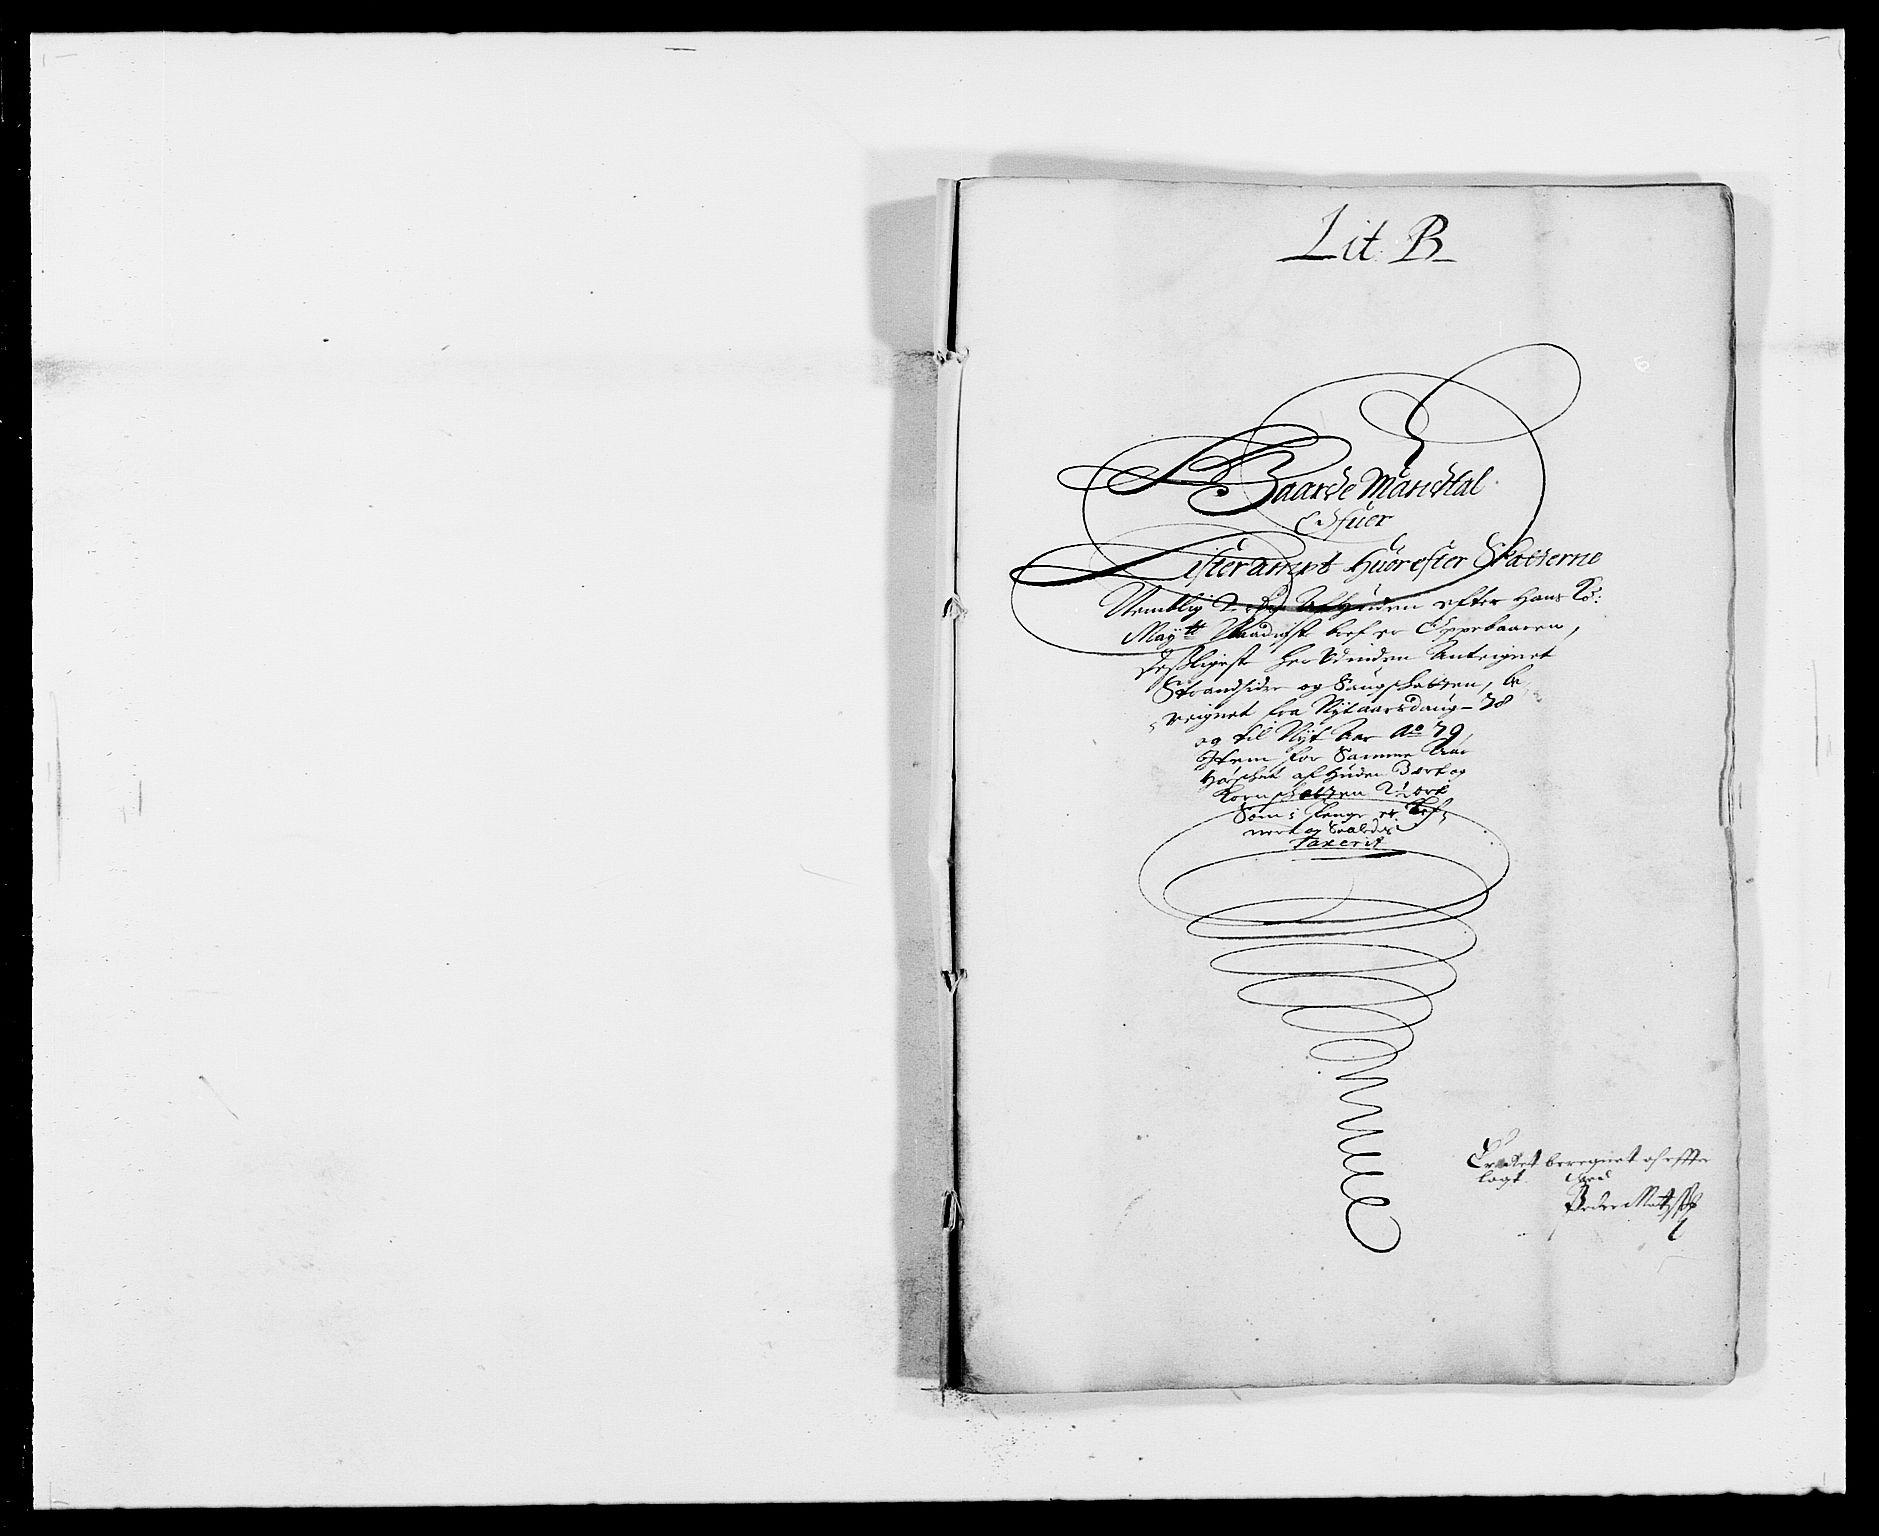 RA, Rentekammeret inntil 1814, Reviderte regnskaper, Fogderegnskap, R41/L2530: Fogderegnskap Lista, 1677-1679, s. 211